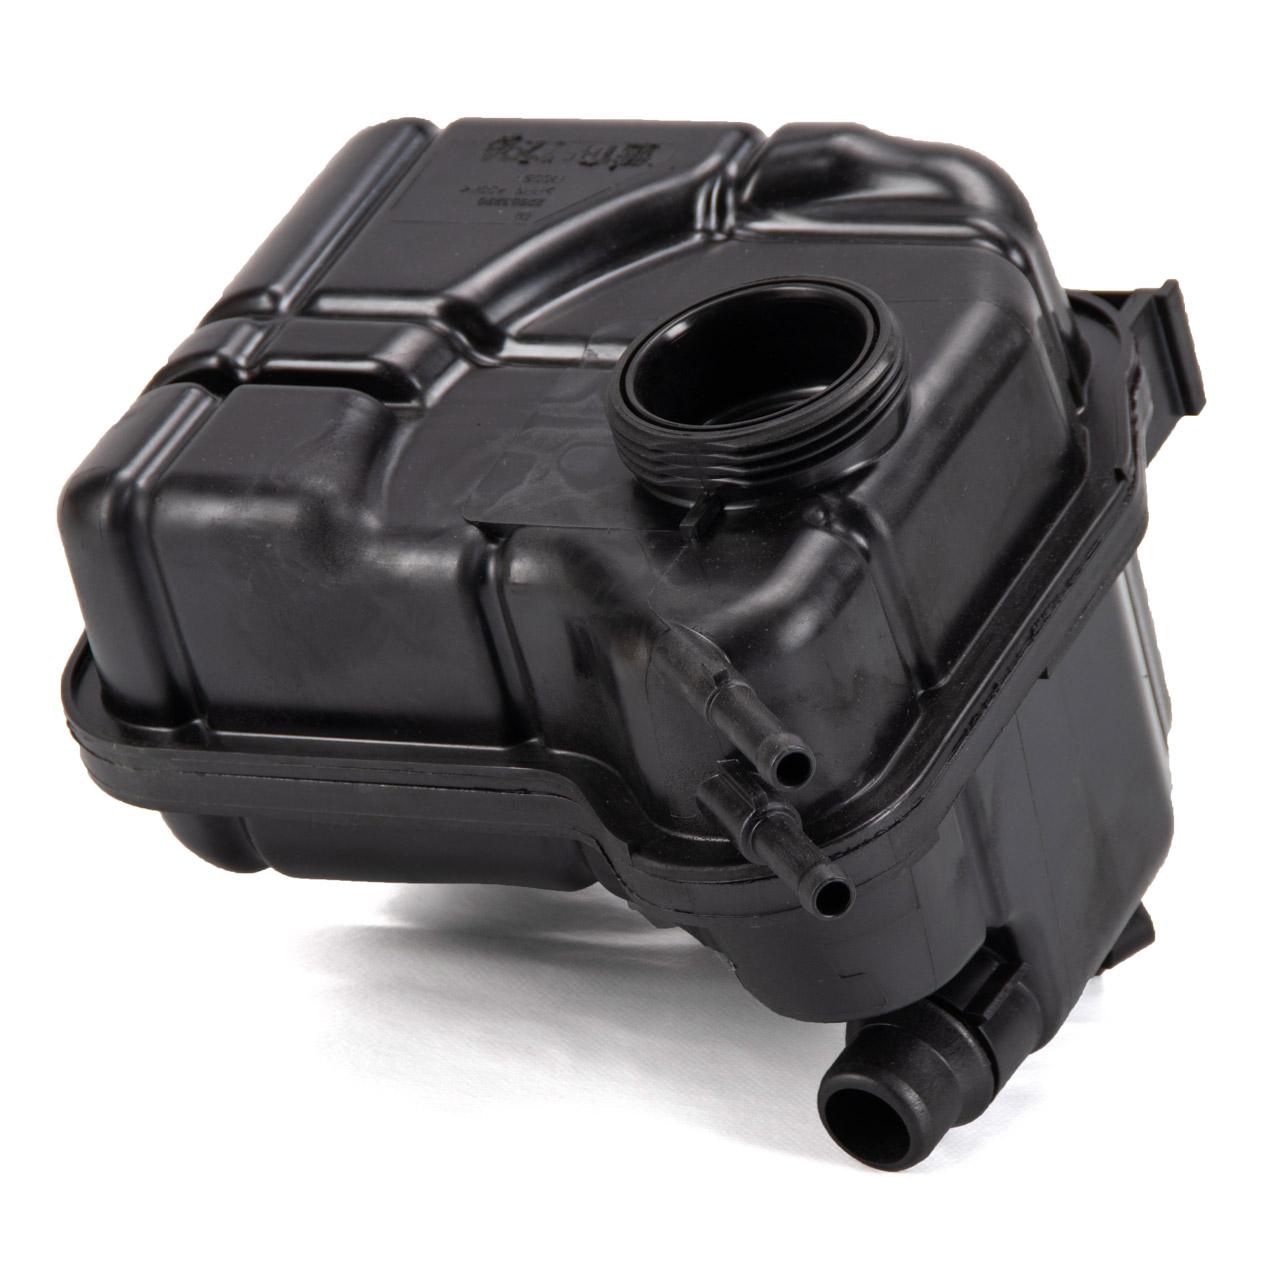 Ausgleichsbehälter Kühlwasser OPEL Insignia 2.8 V6 Turbo OPC 22953220